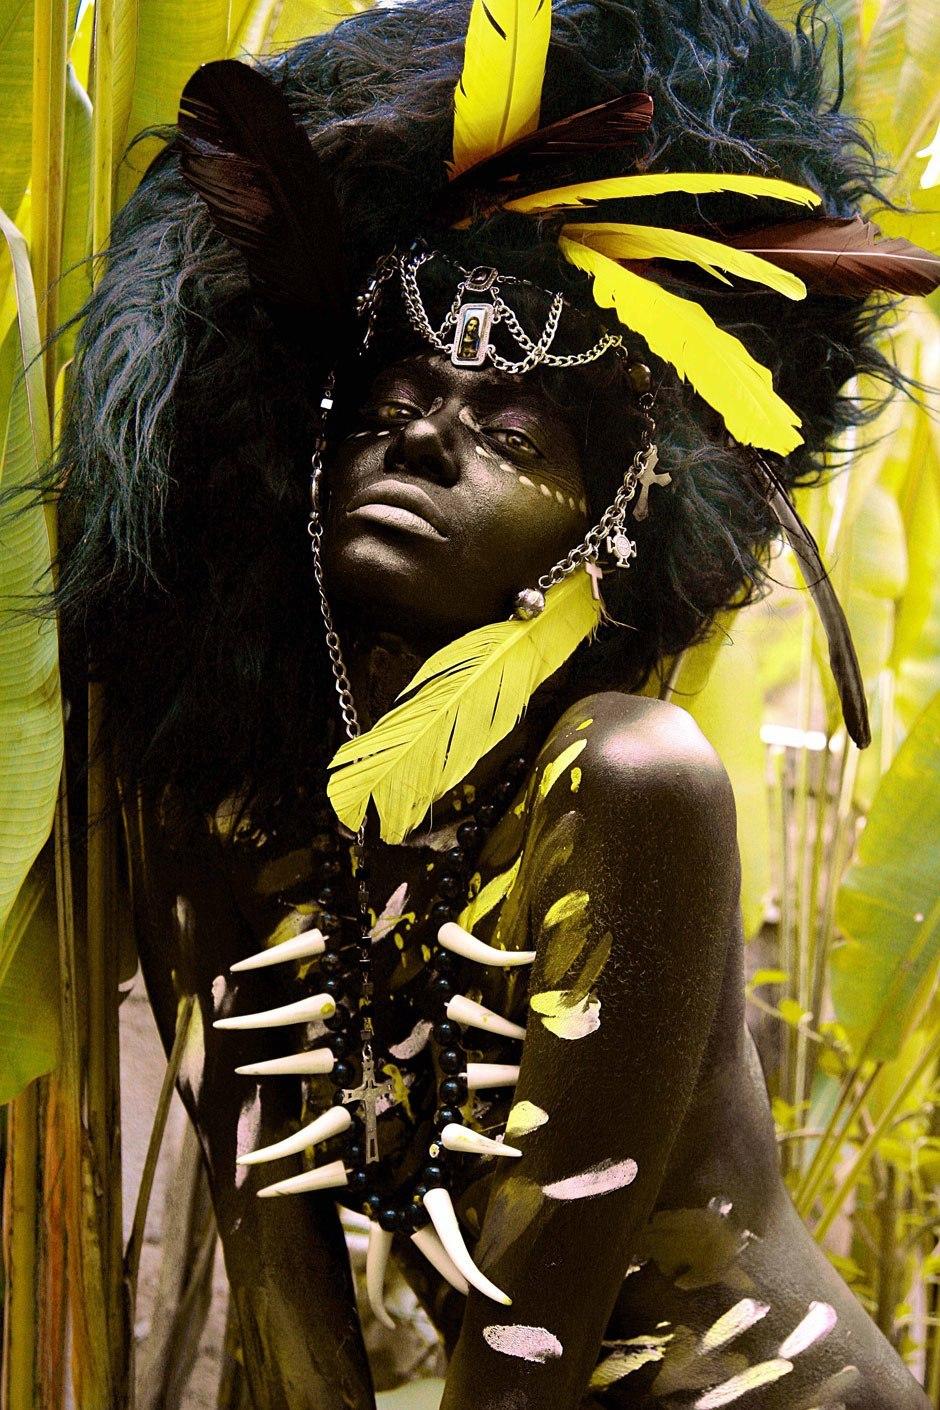 'Africa'+by+Daniel+Bracci+(8).jpg